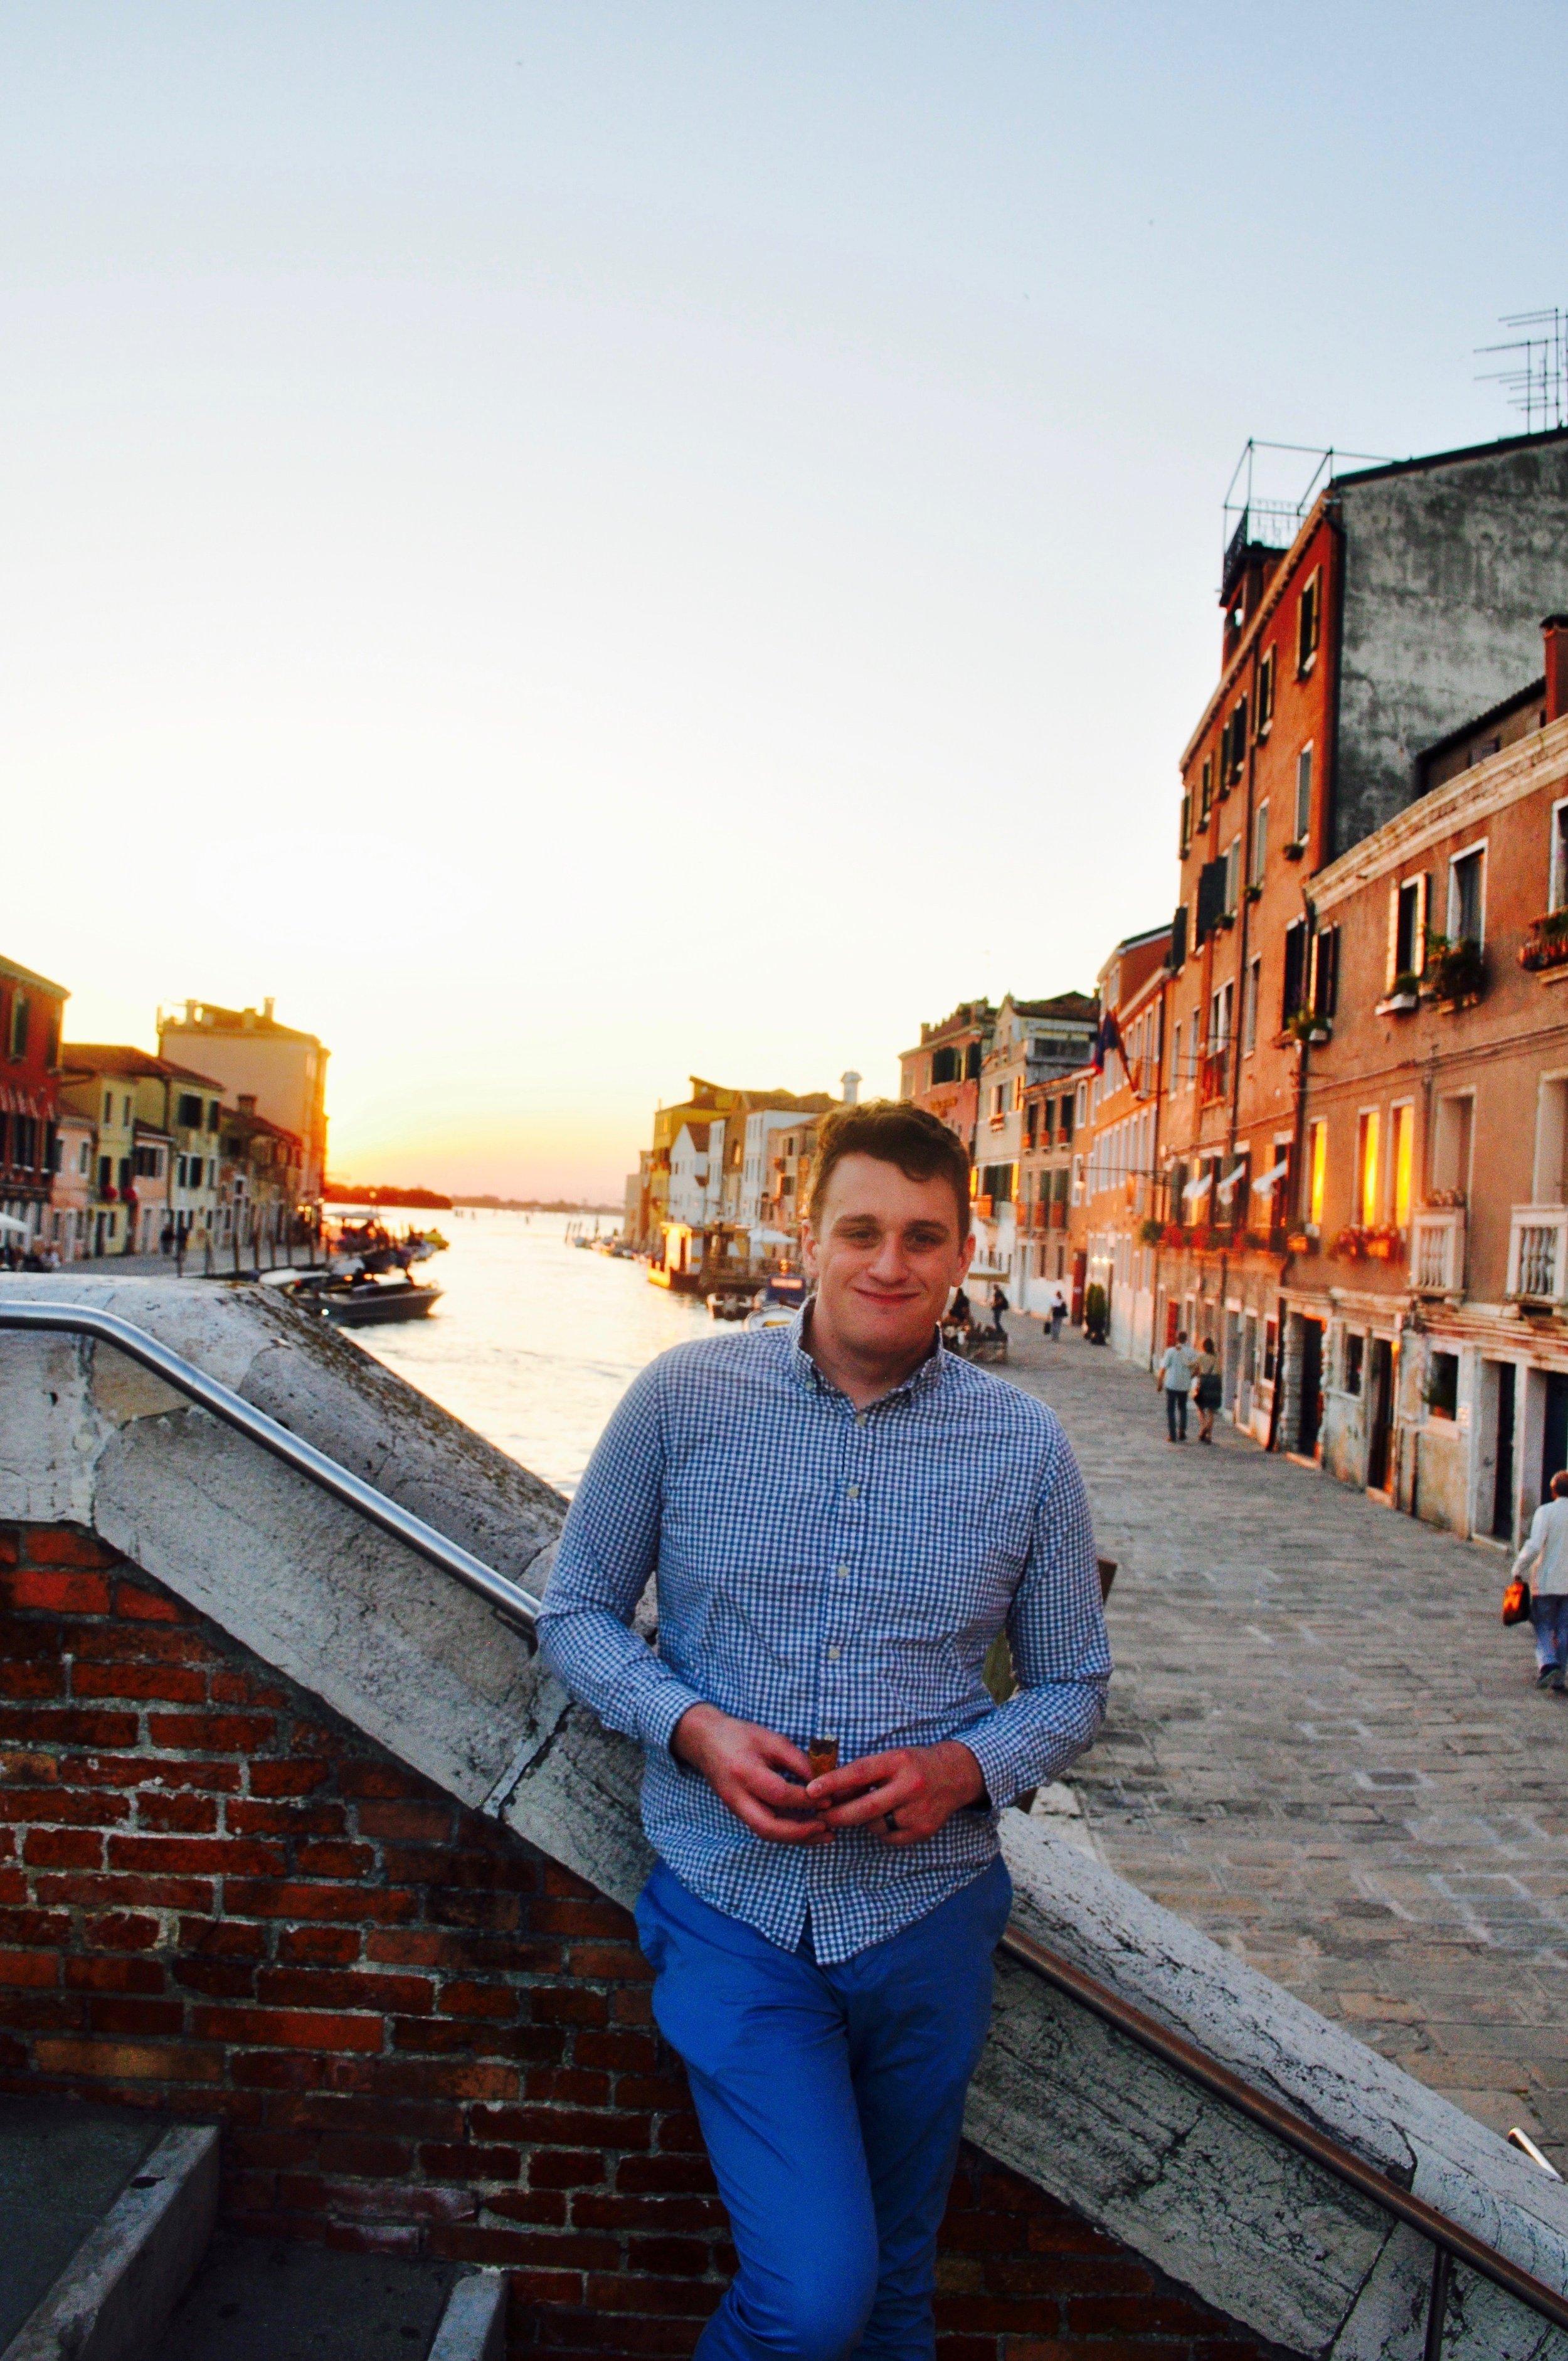 Enjoying Gelato at Sunset in Venice